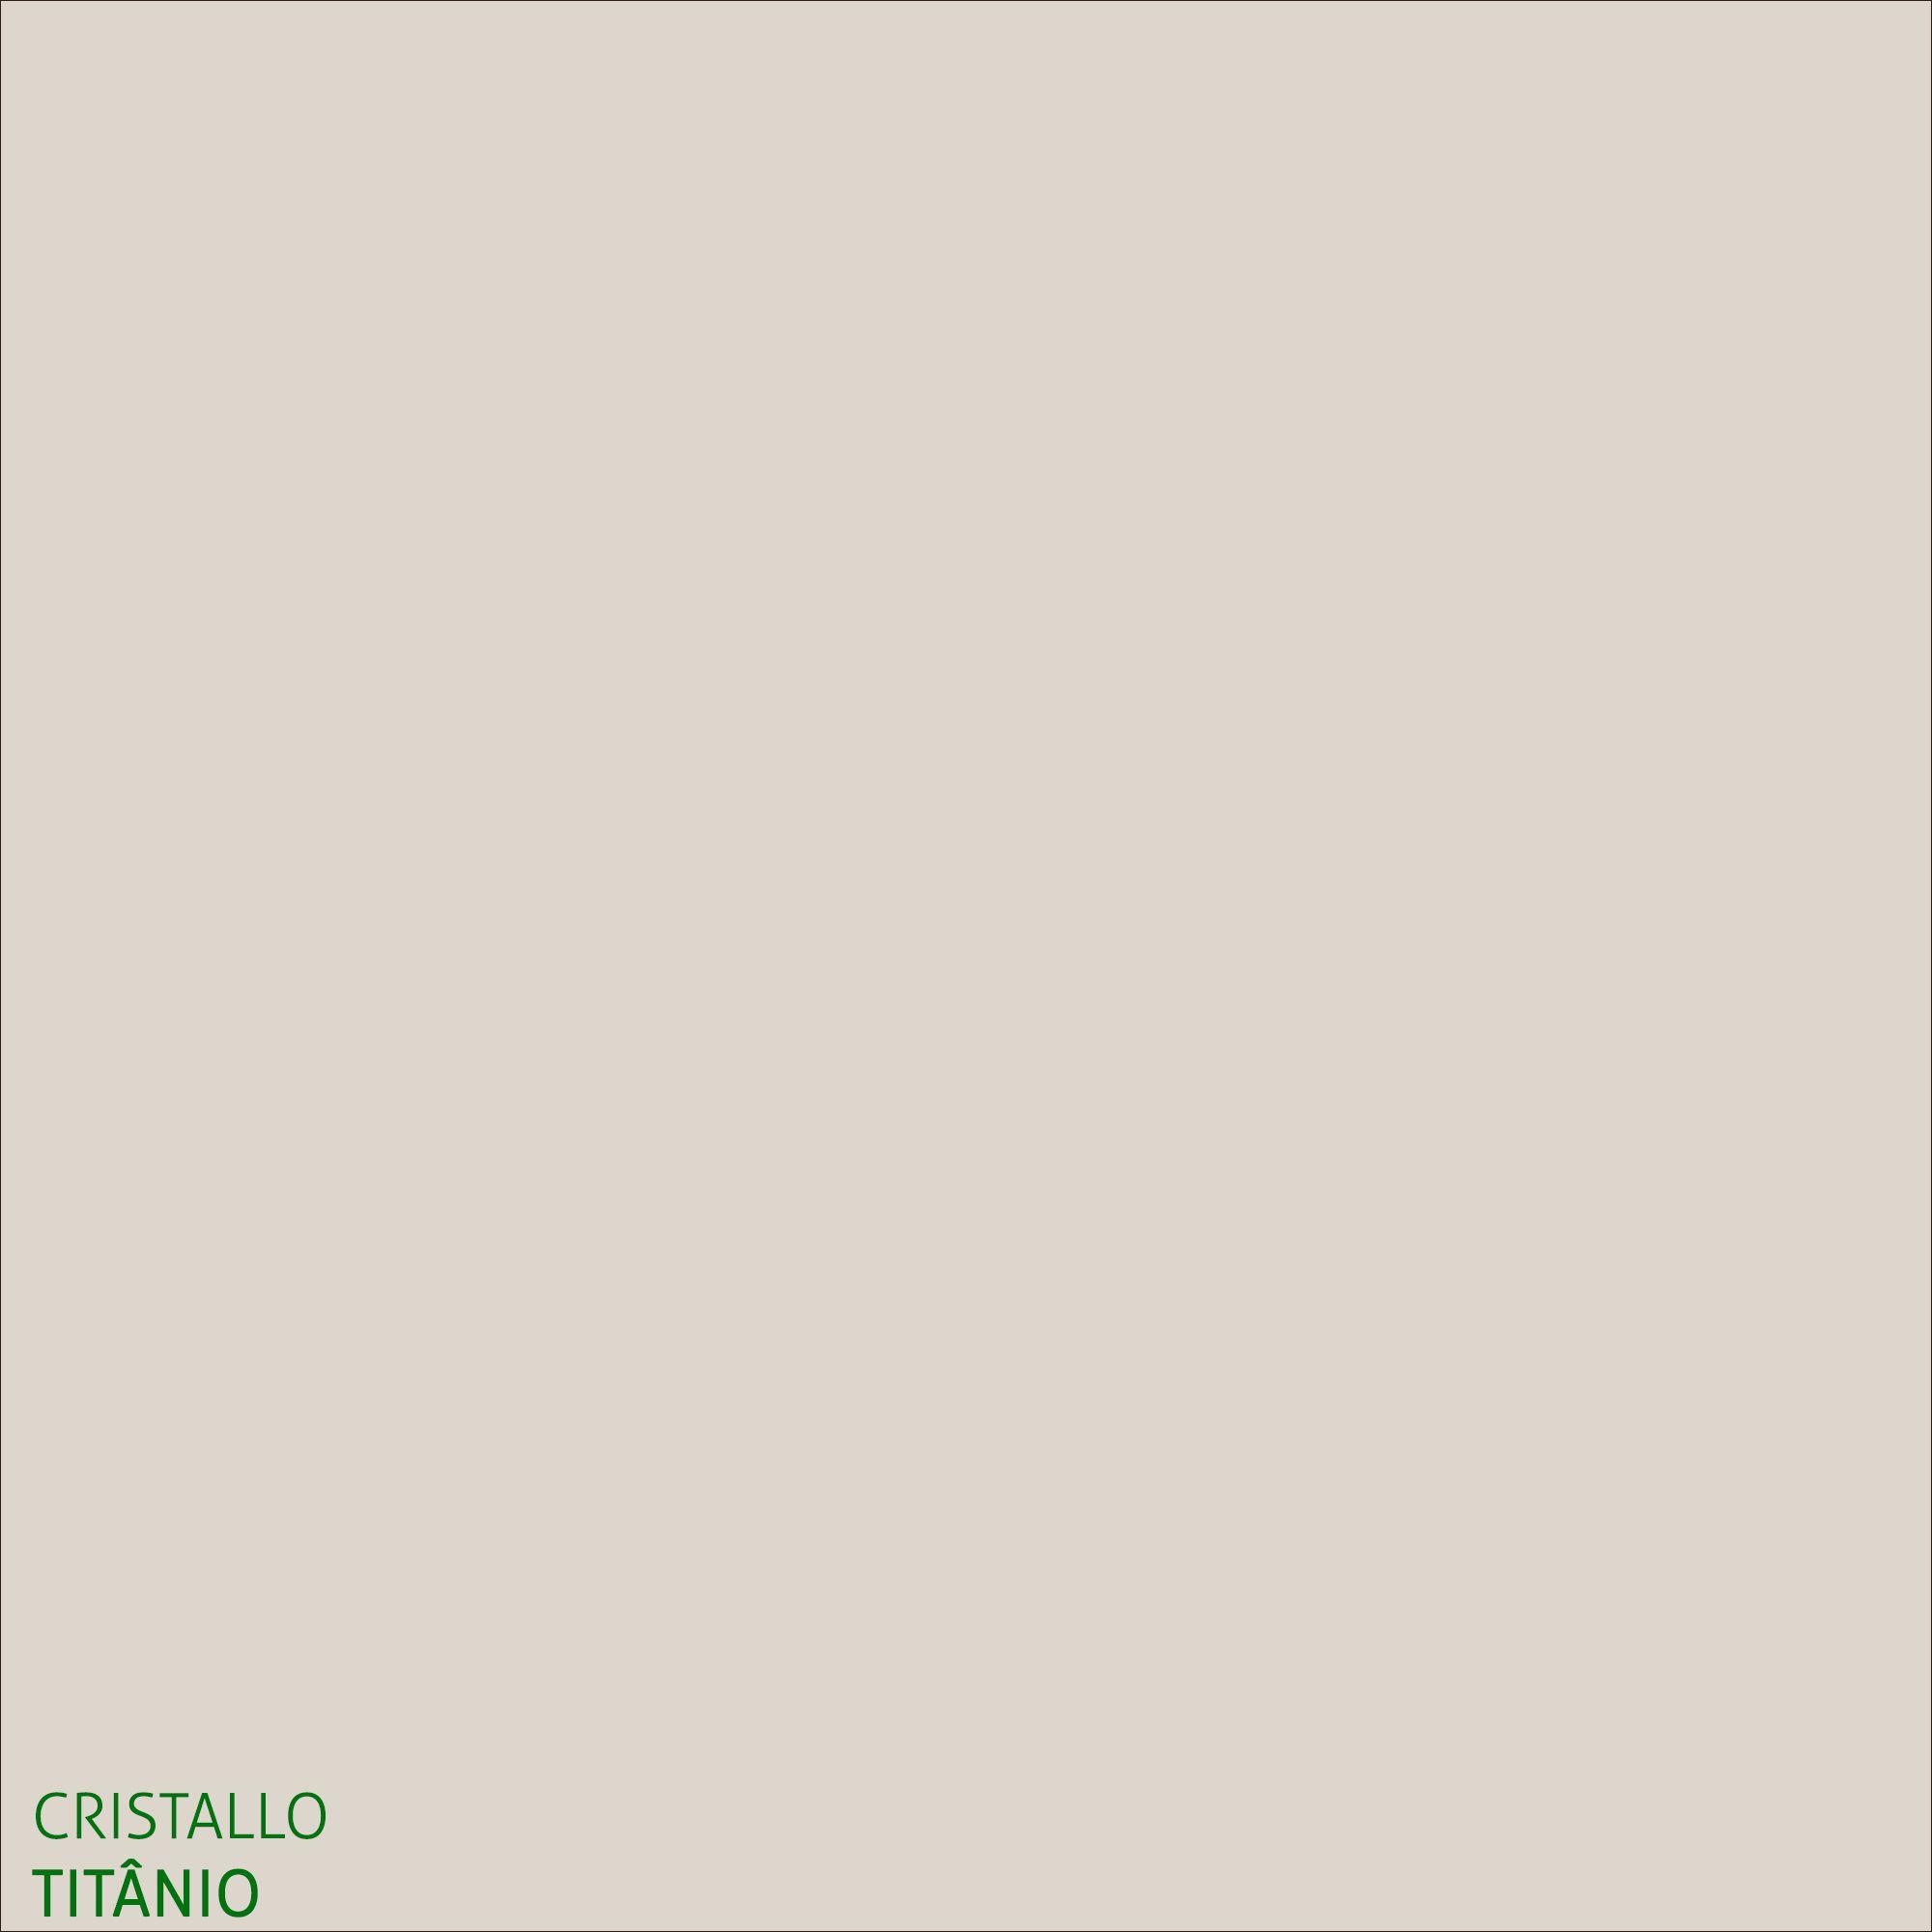 MDF Cristallo Tiânio 2.750 x 1.840 mm Duratex